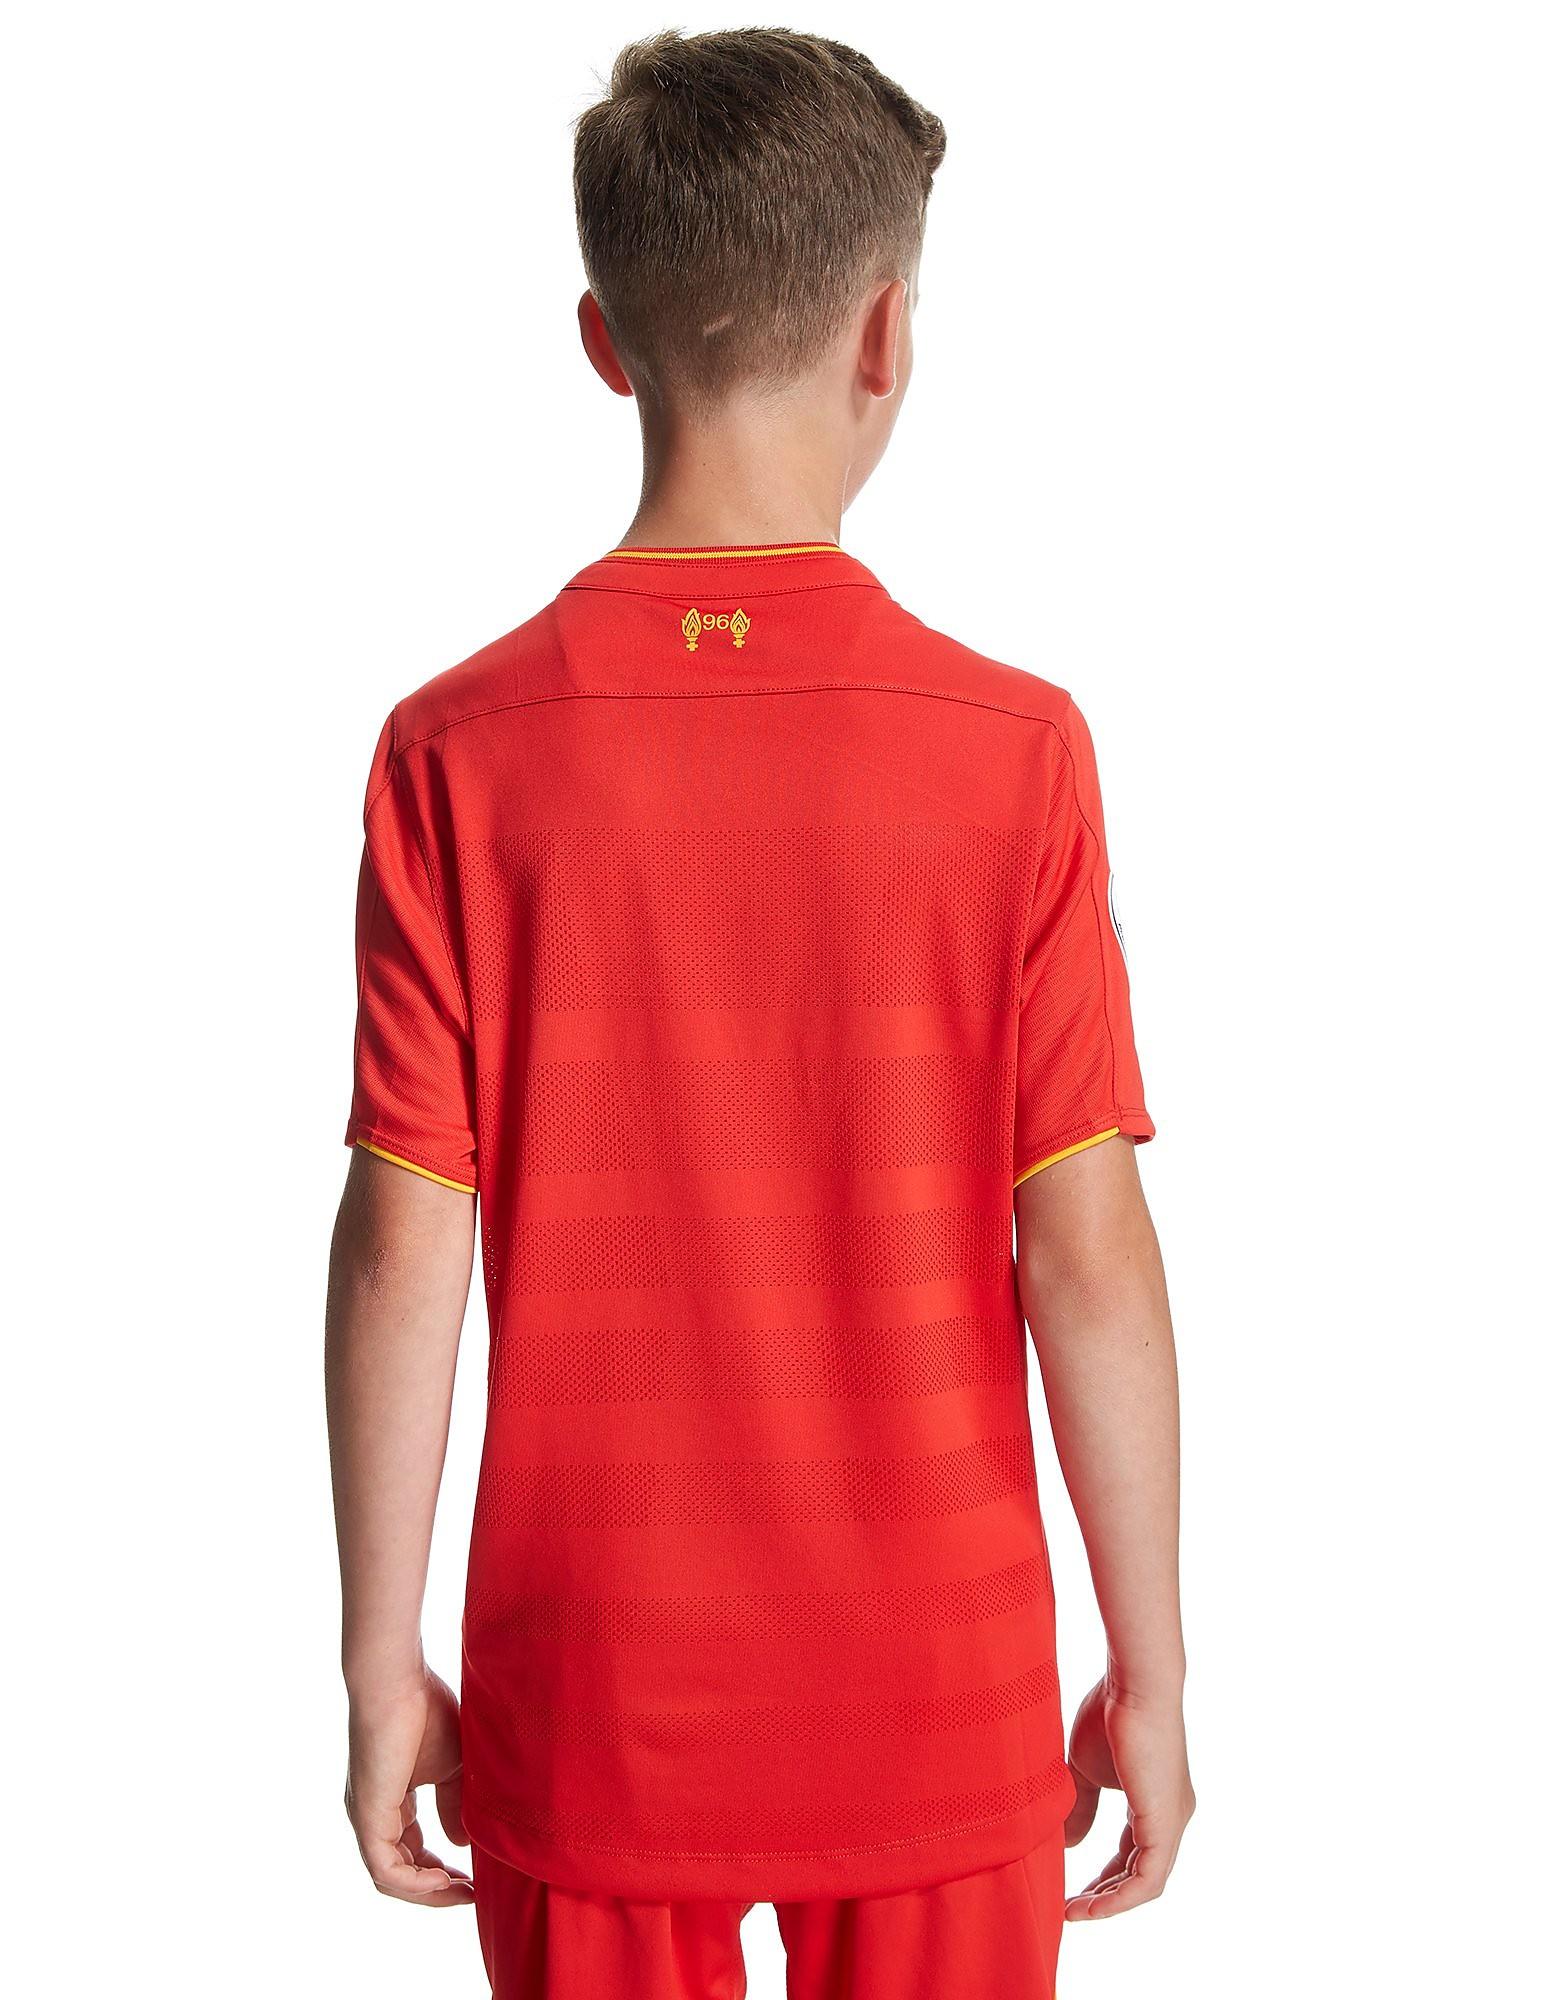 New Balance Liverpool FC 2016/17 Home Prem Badge Shirt Jnr